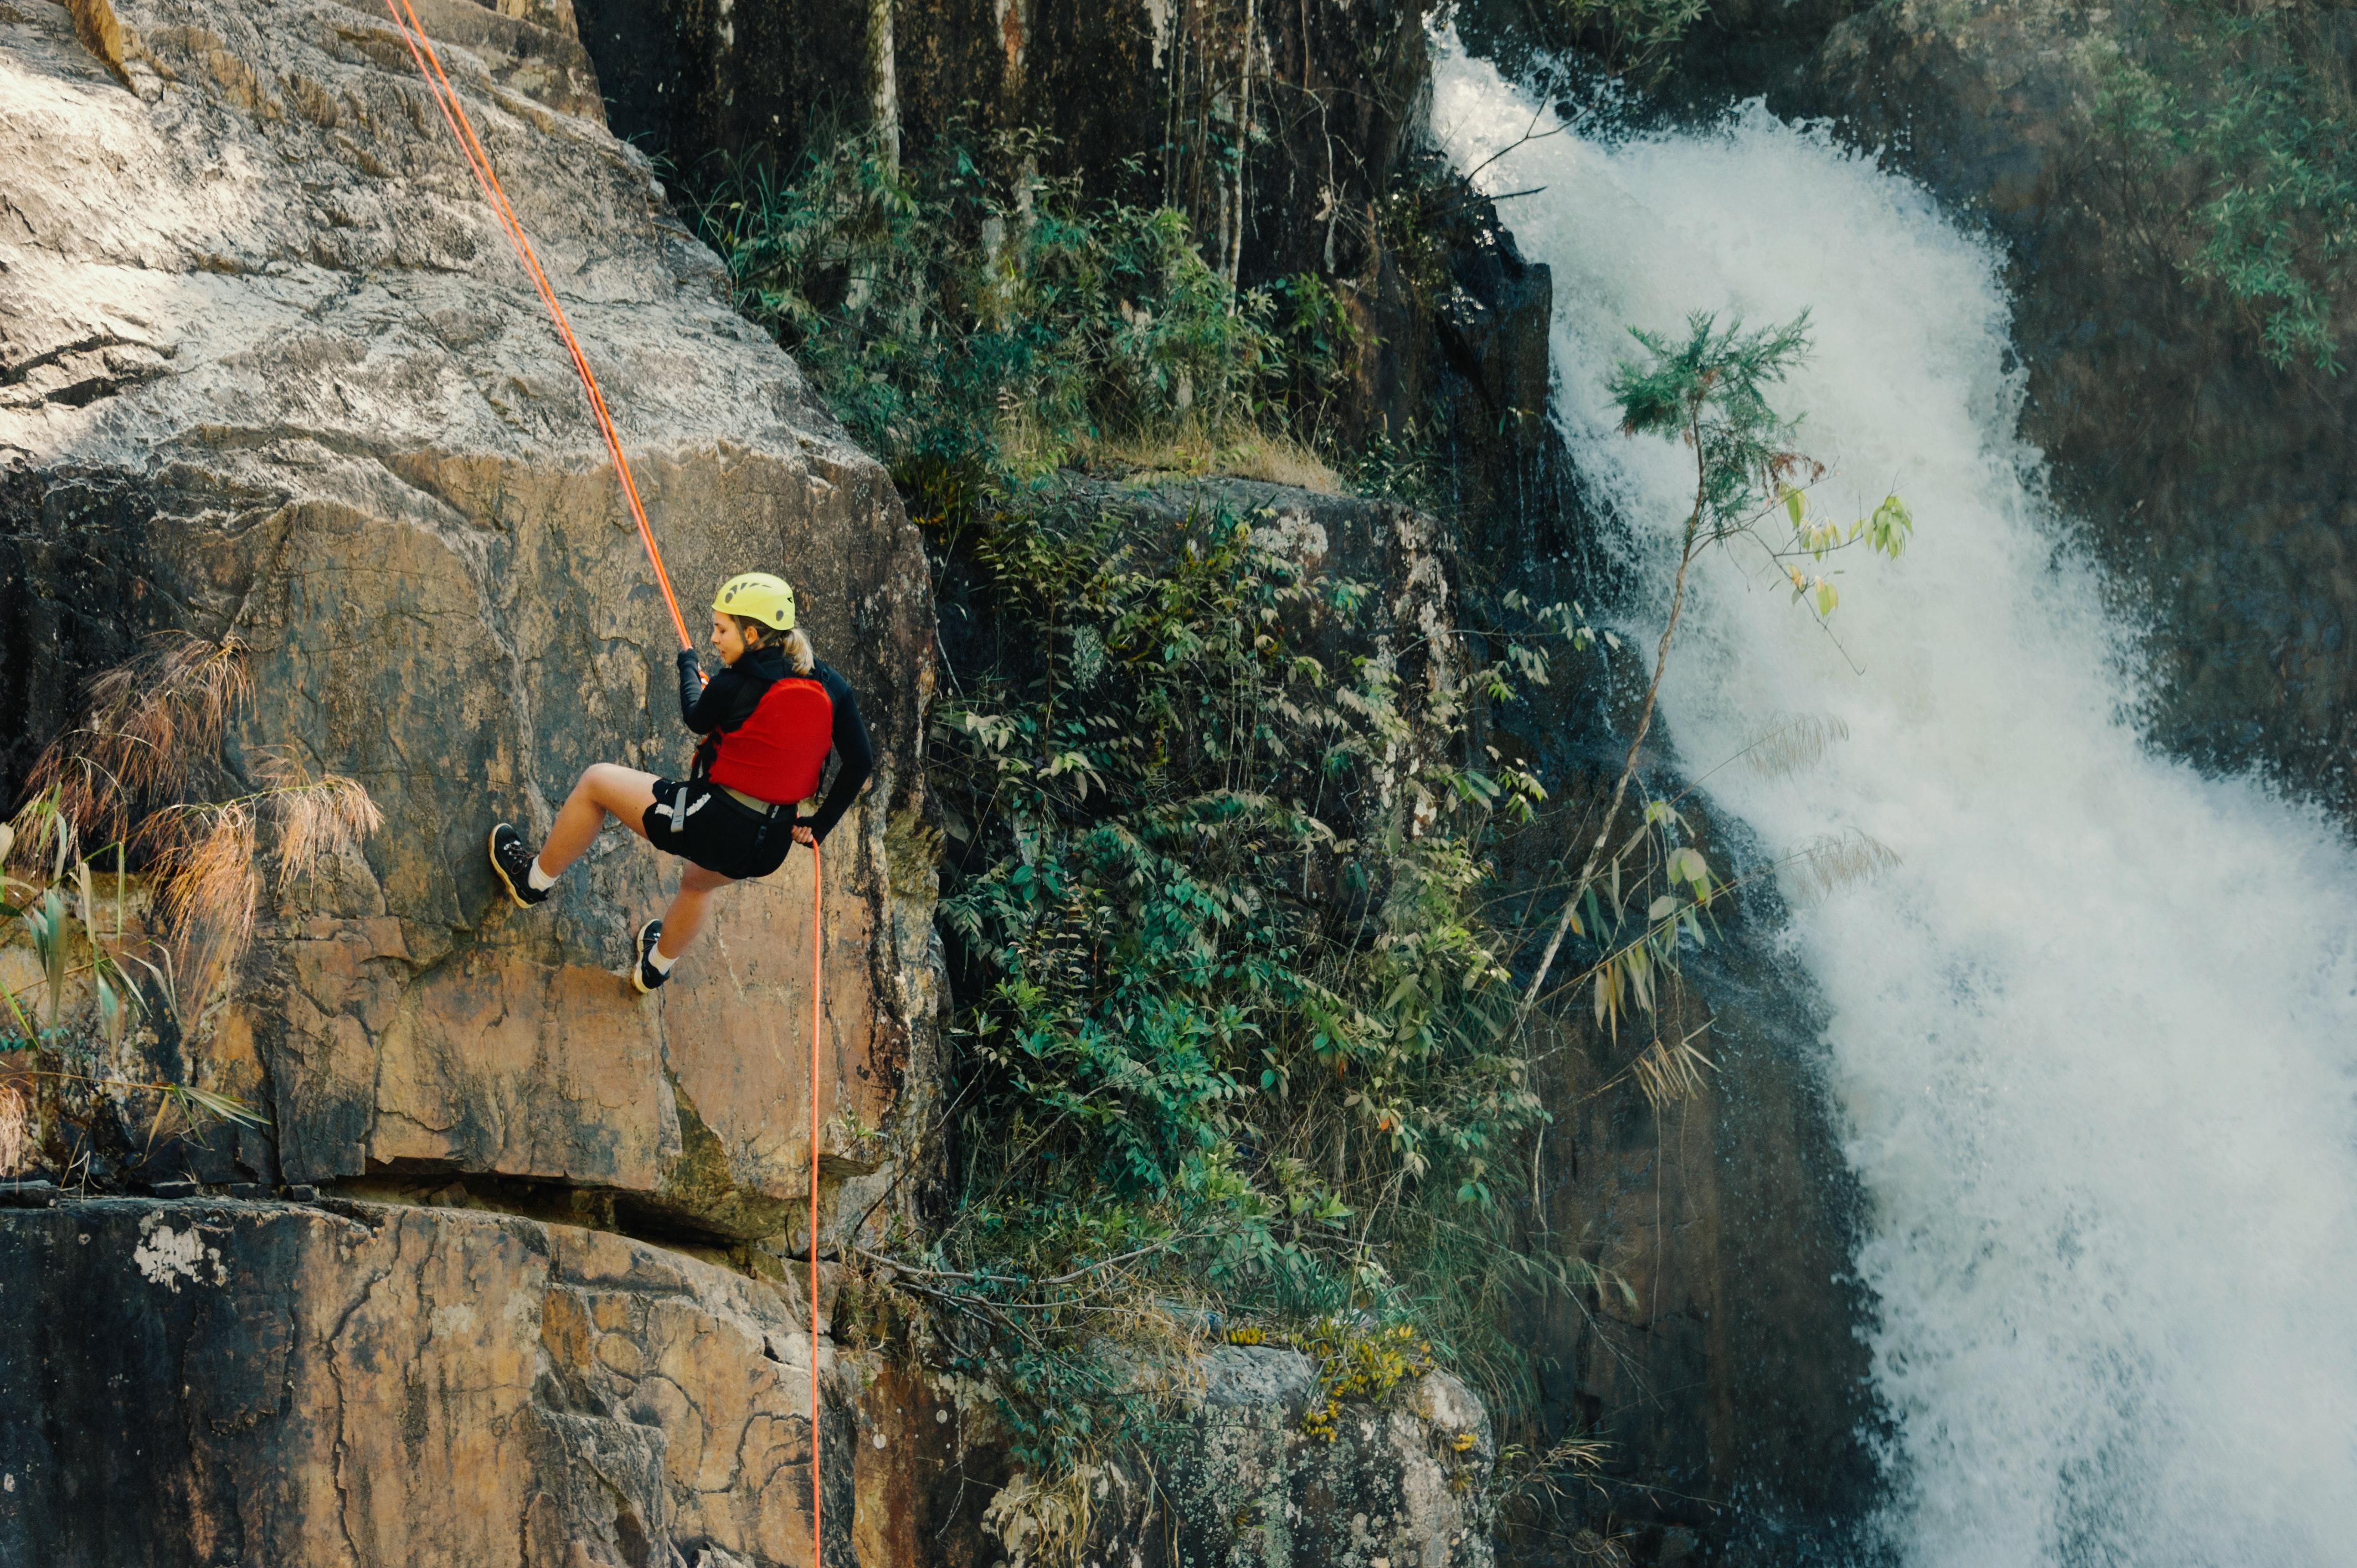 poto rock climbing low budget interior design1000 amazing rock climbing photos · pexels · free stock photoswoman rocking climbing near waterfalls